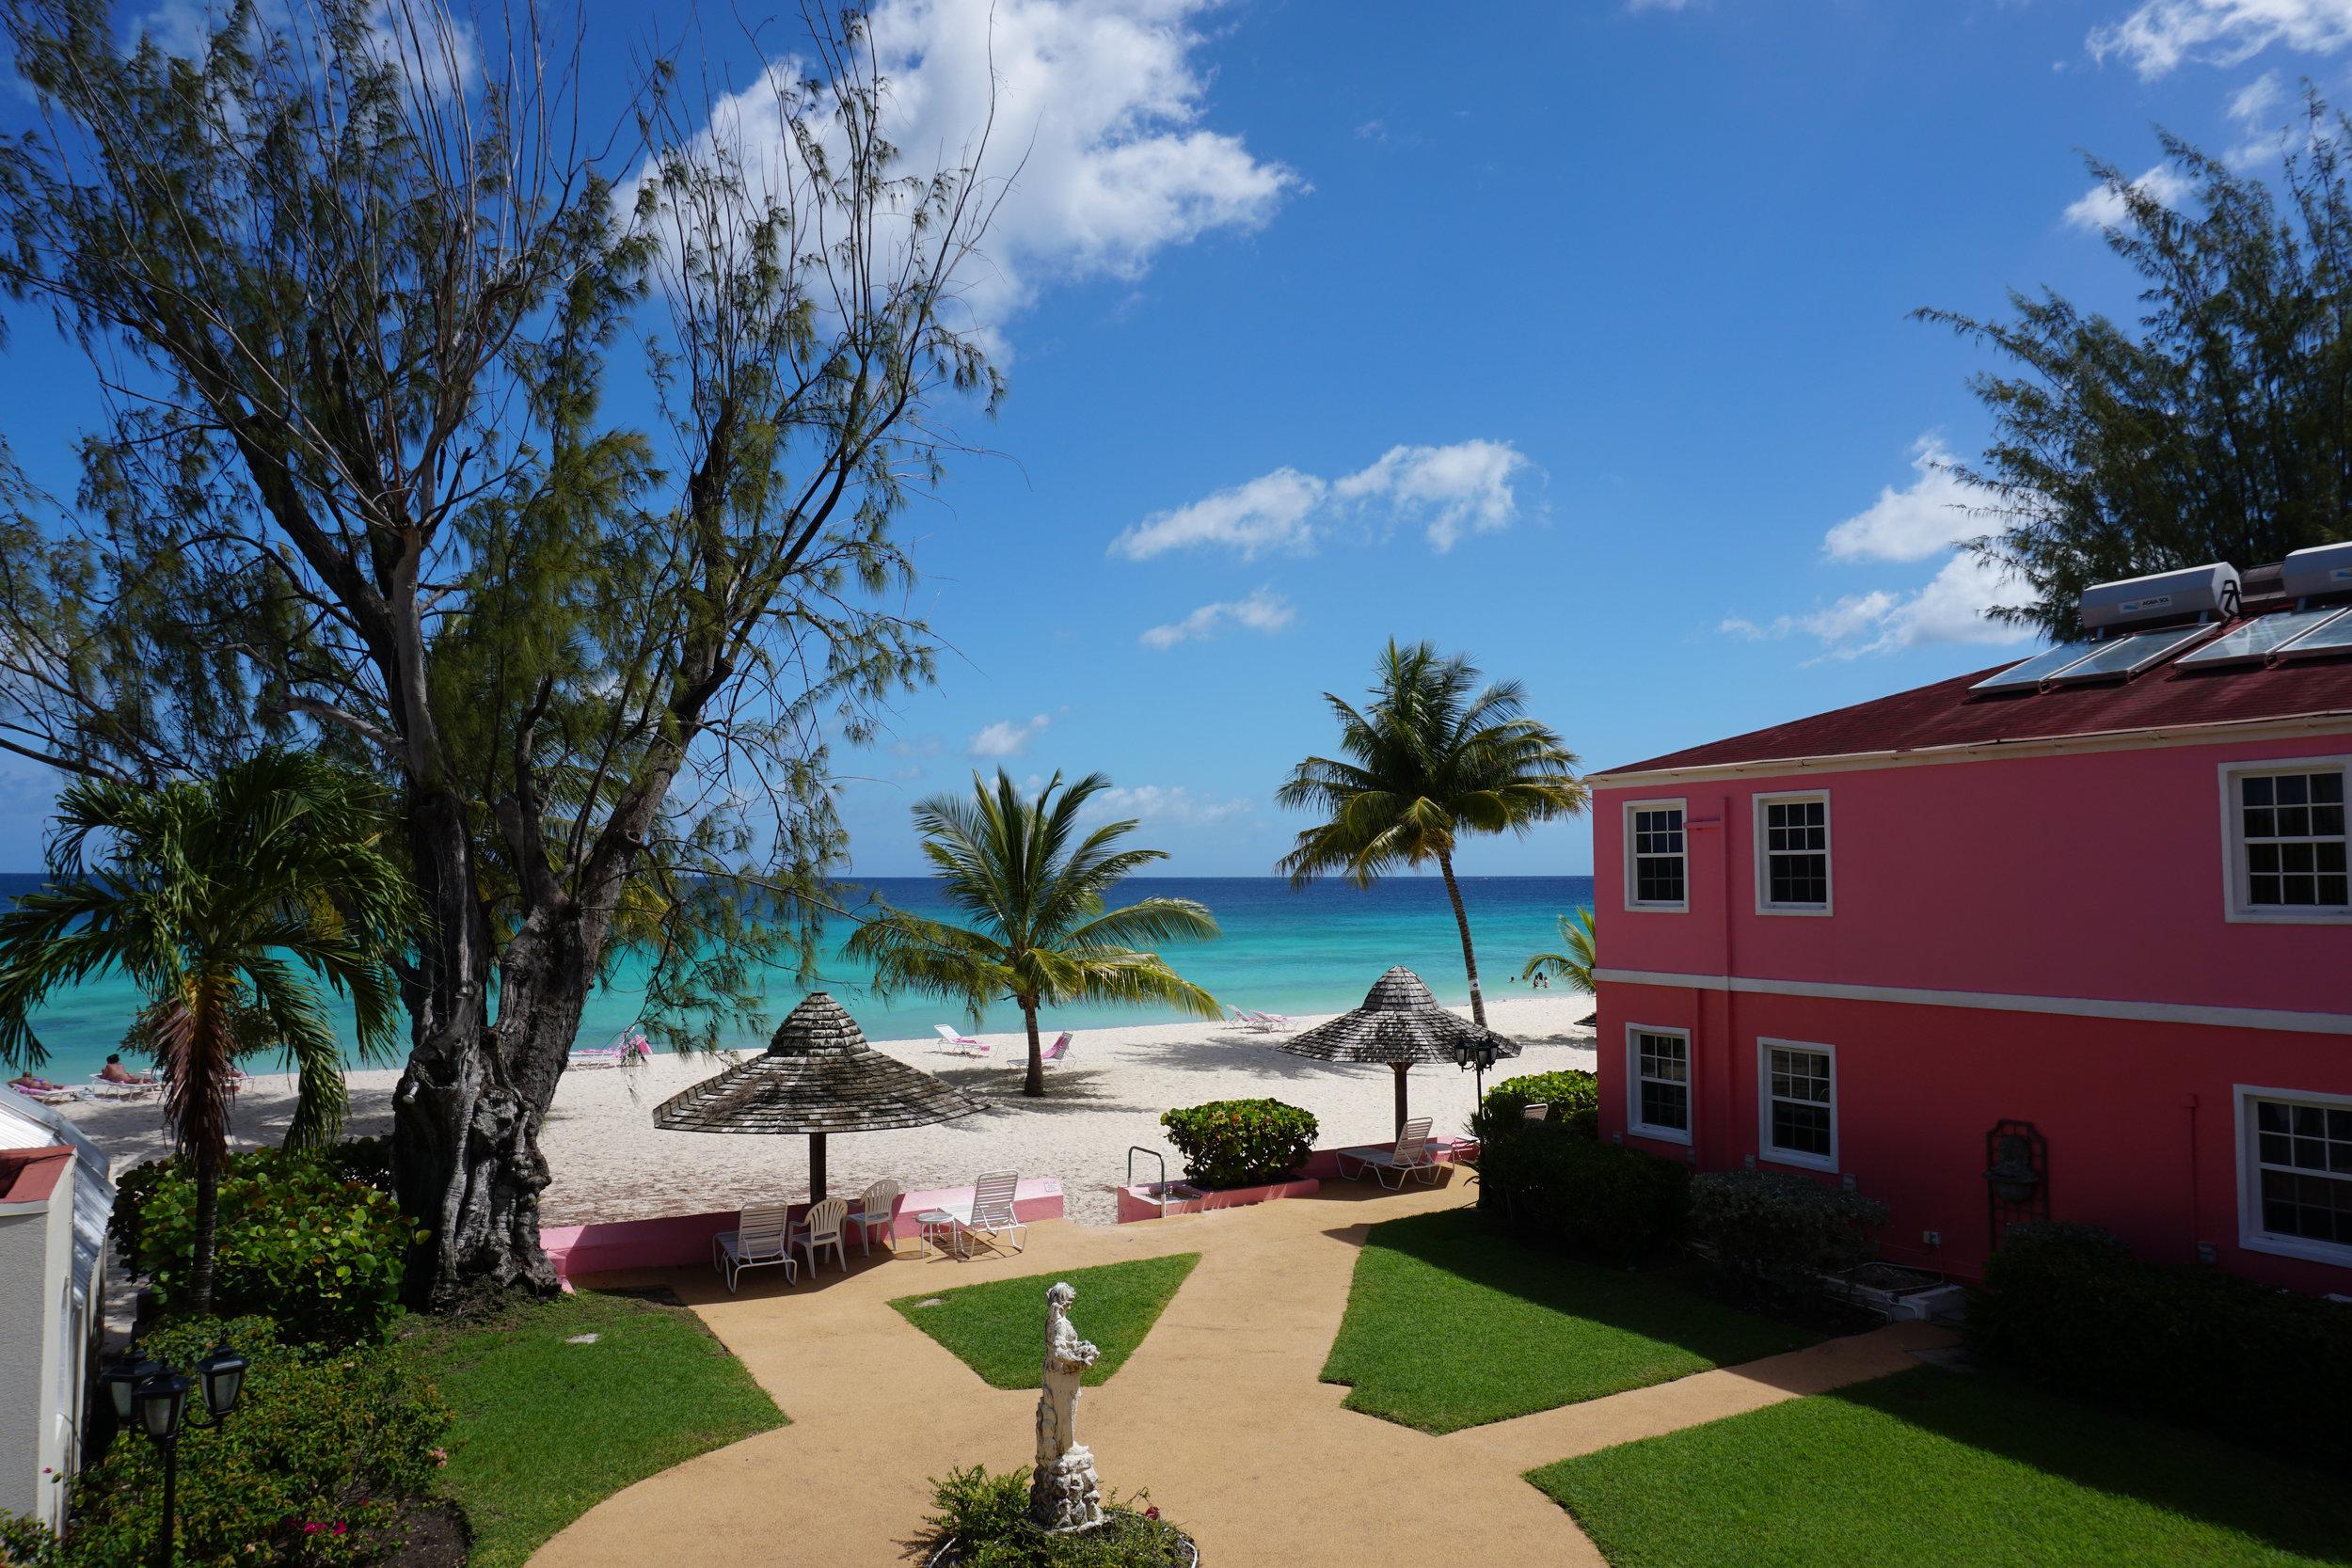 Southern Palms Resort, Barbados/St. Lawrence Gap - TripAdvisor